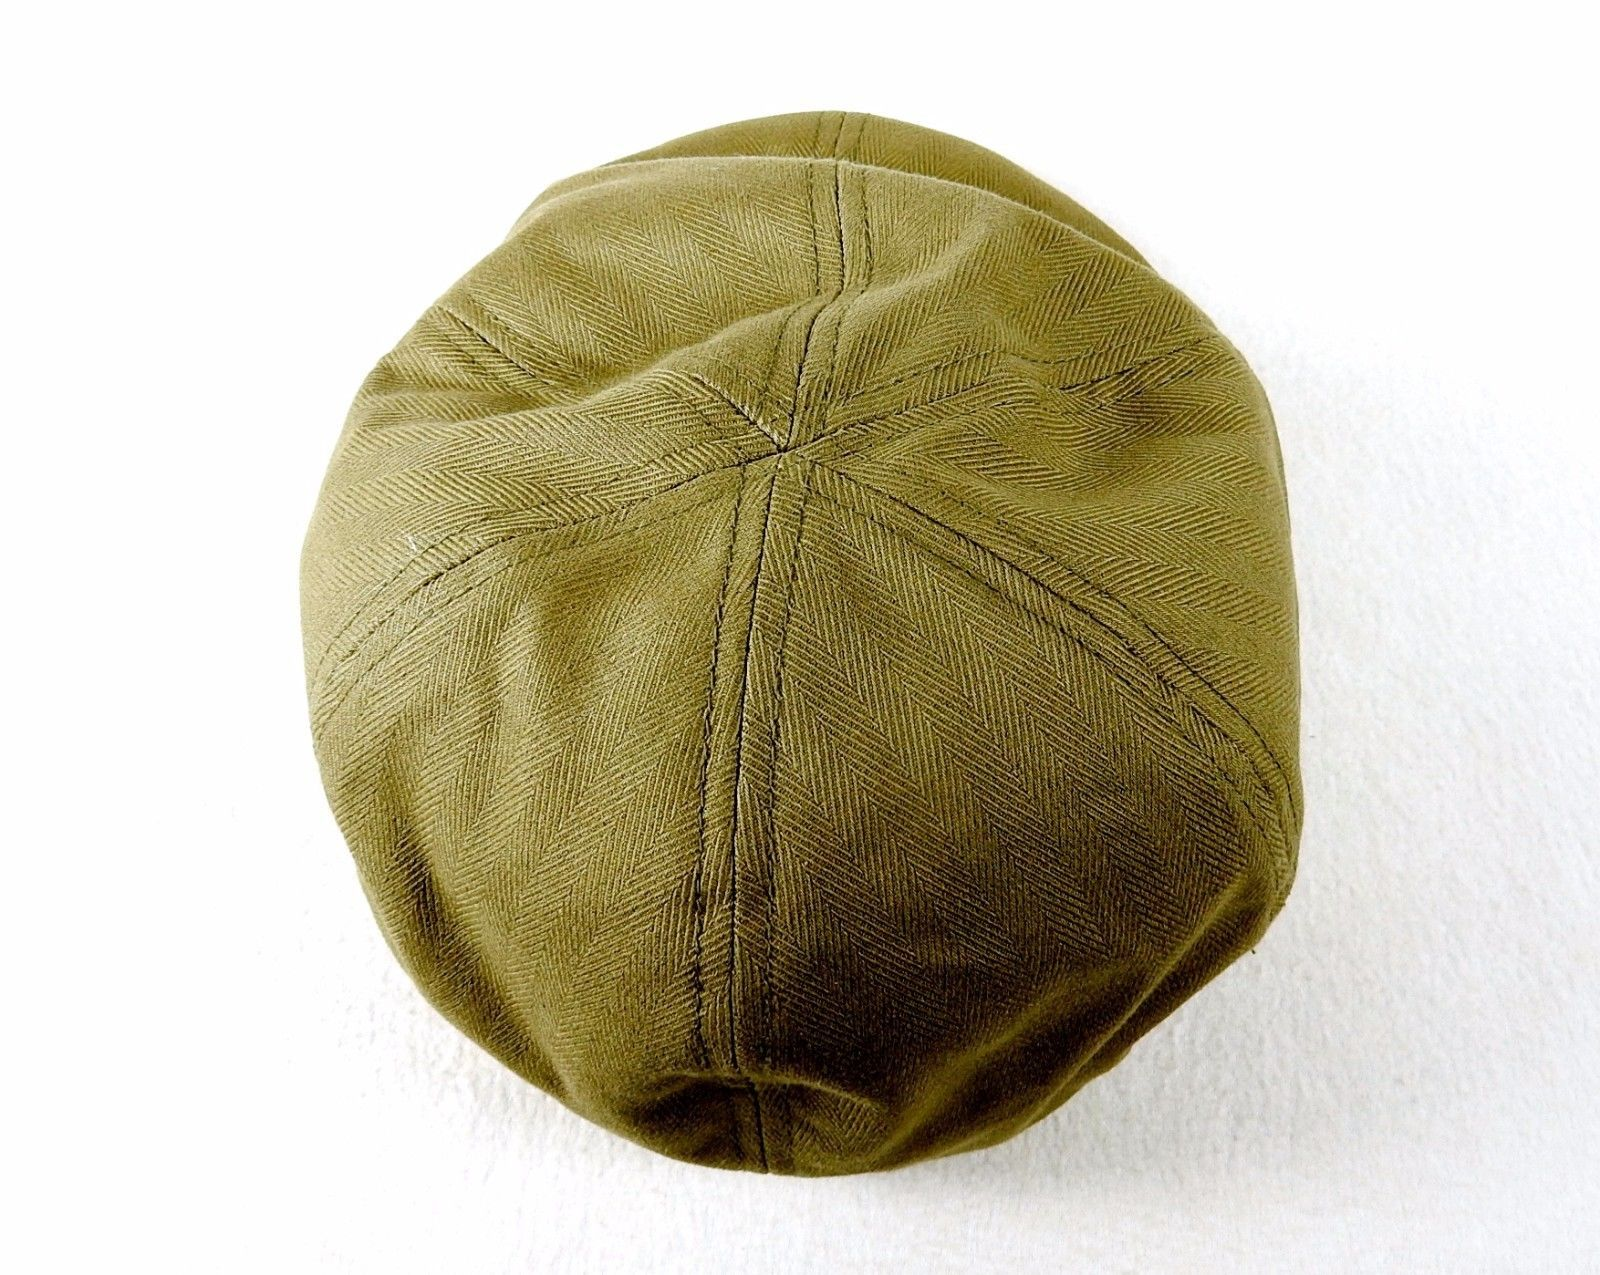 Olive Green Driver's Cap, Spandex Headband, One Size Fits Most, FlexFit #9180